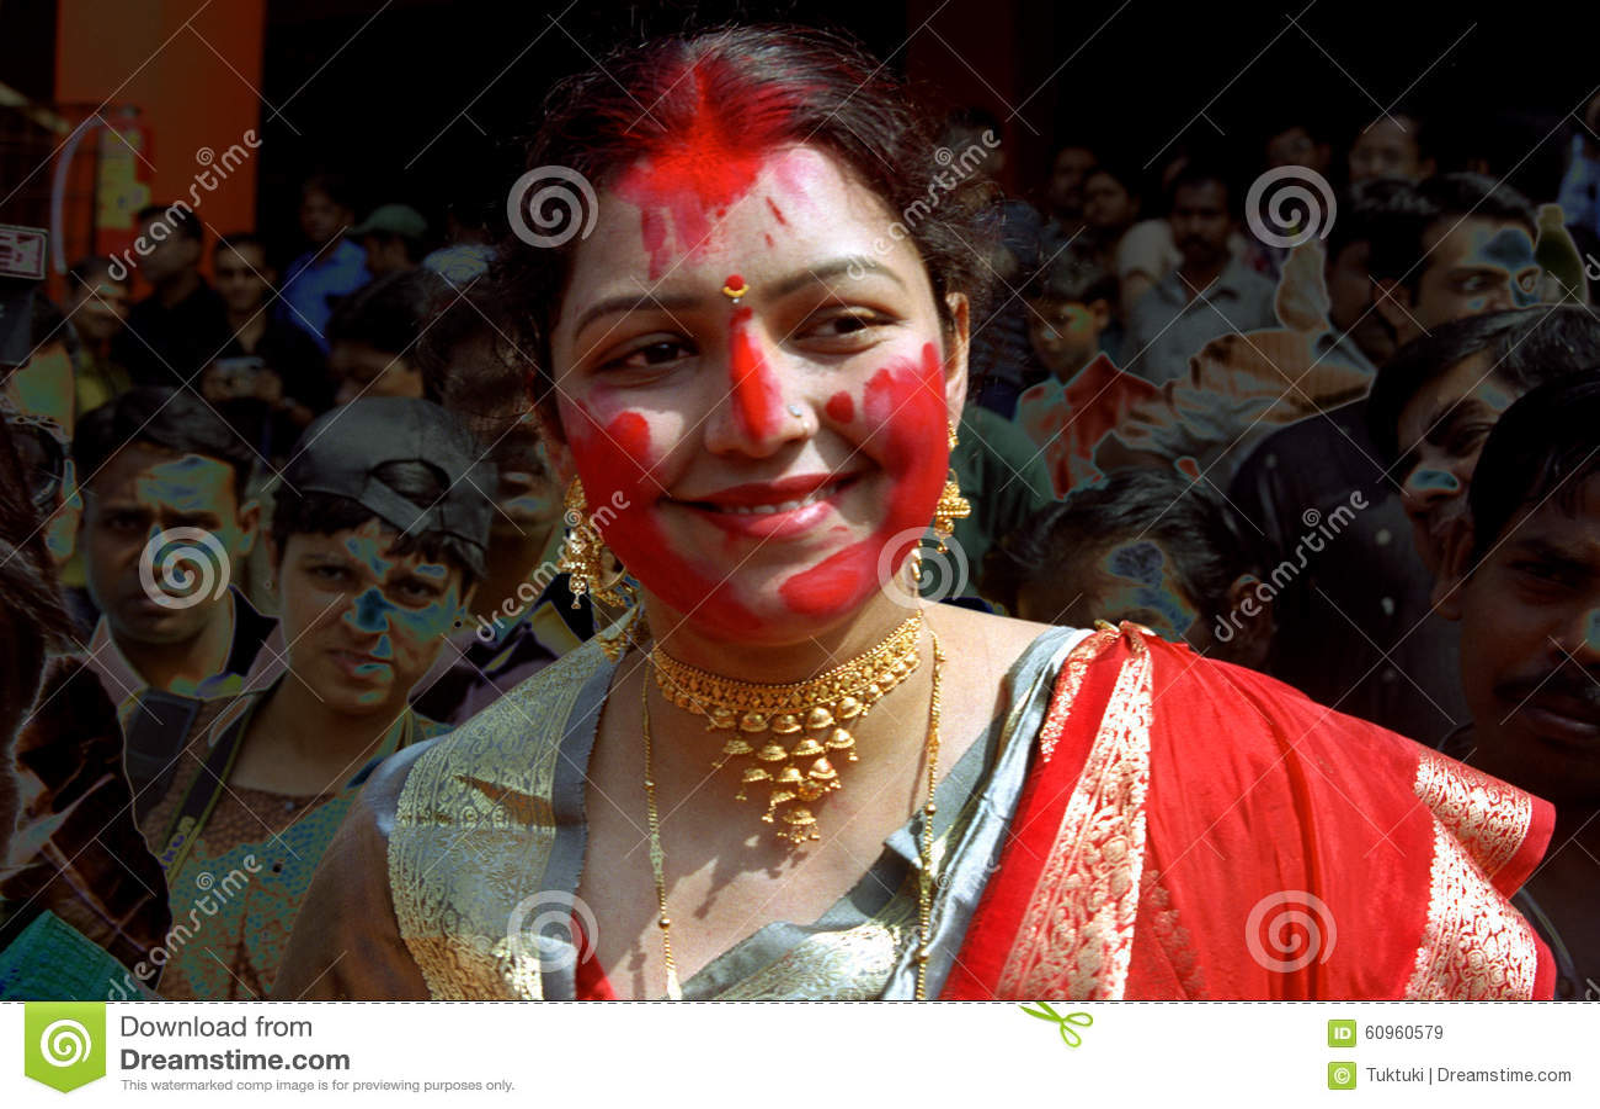 nude bengali woman photo